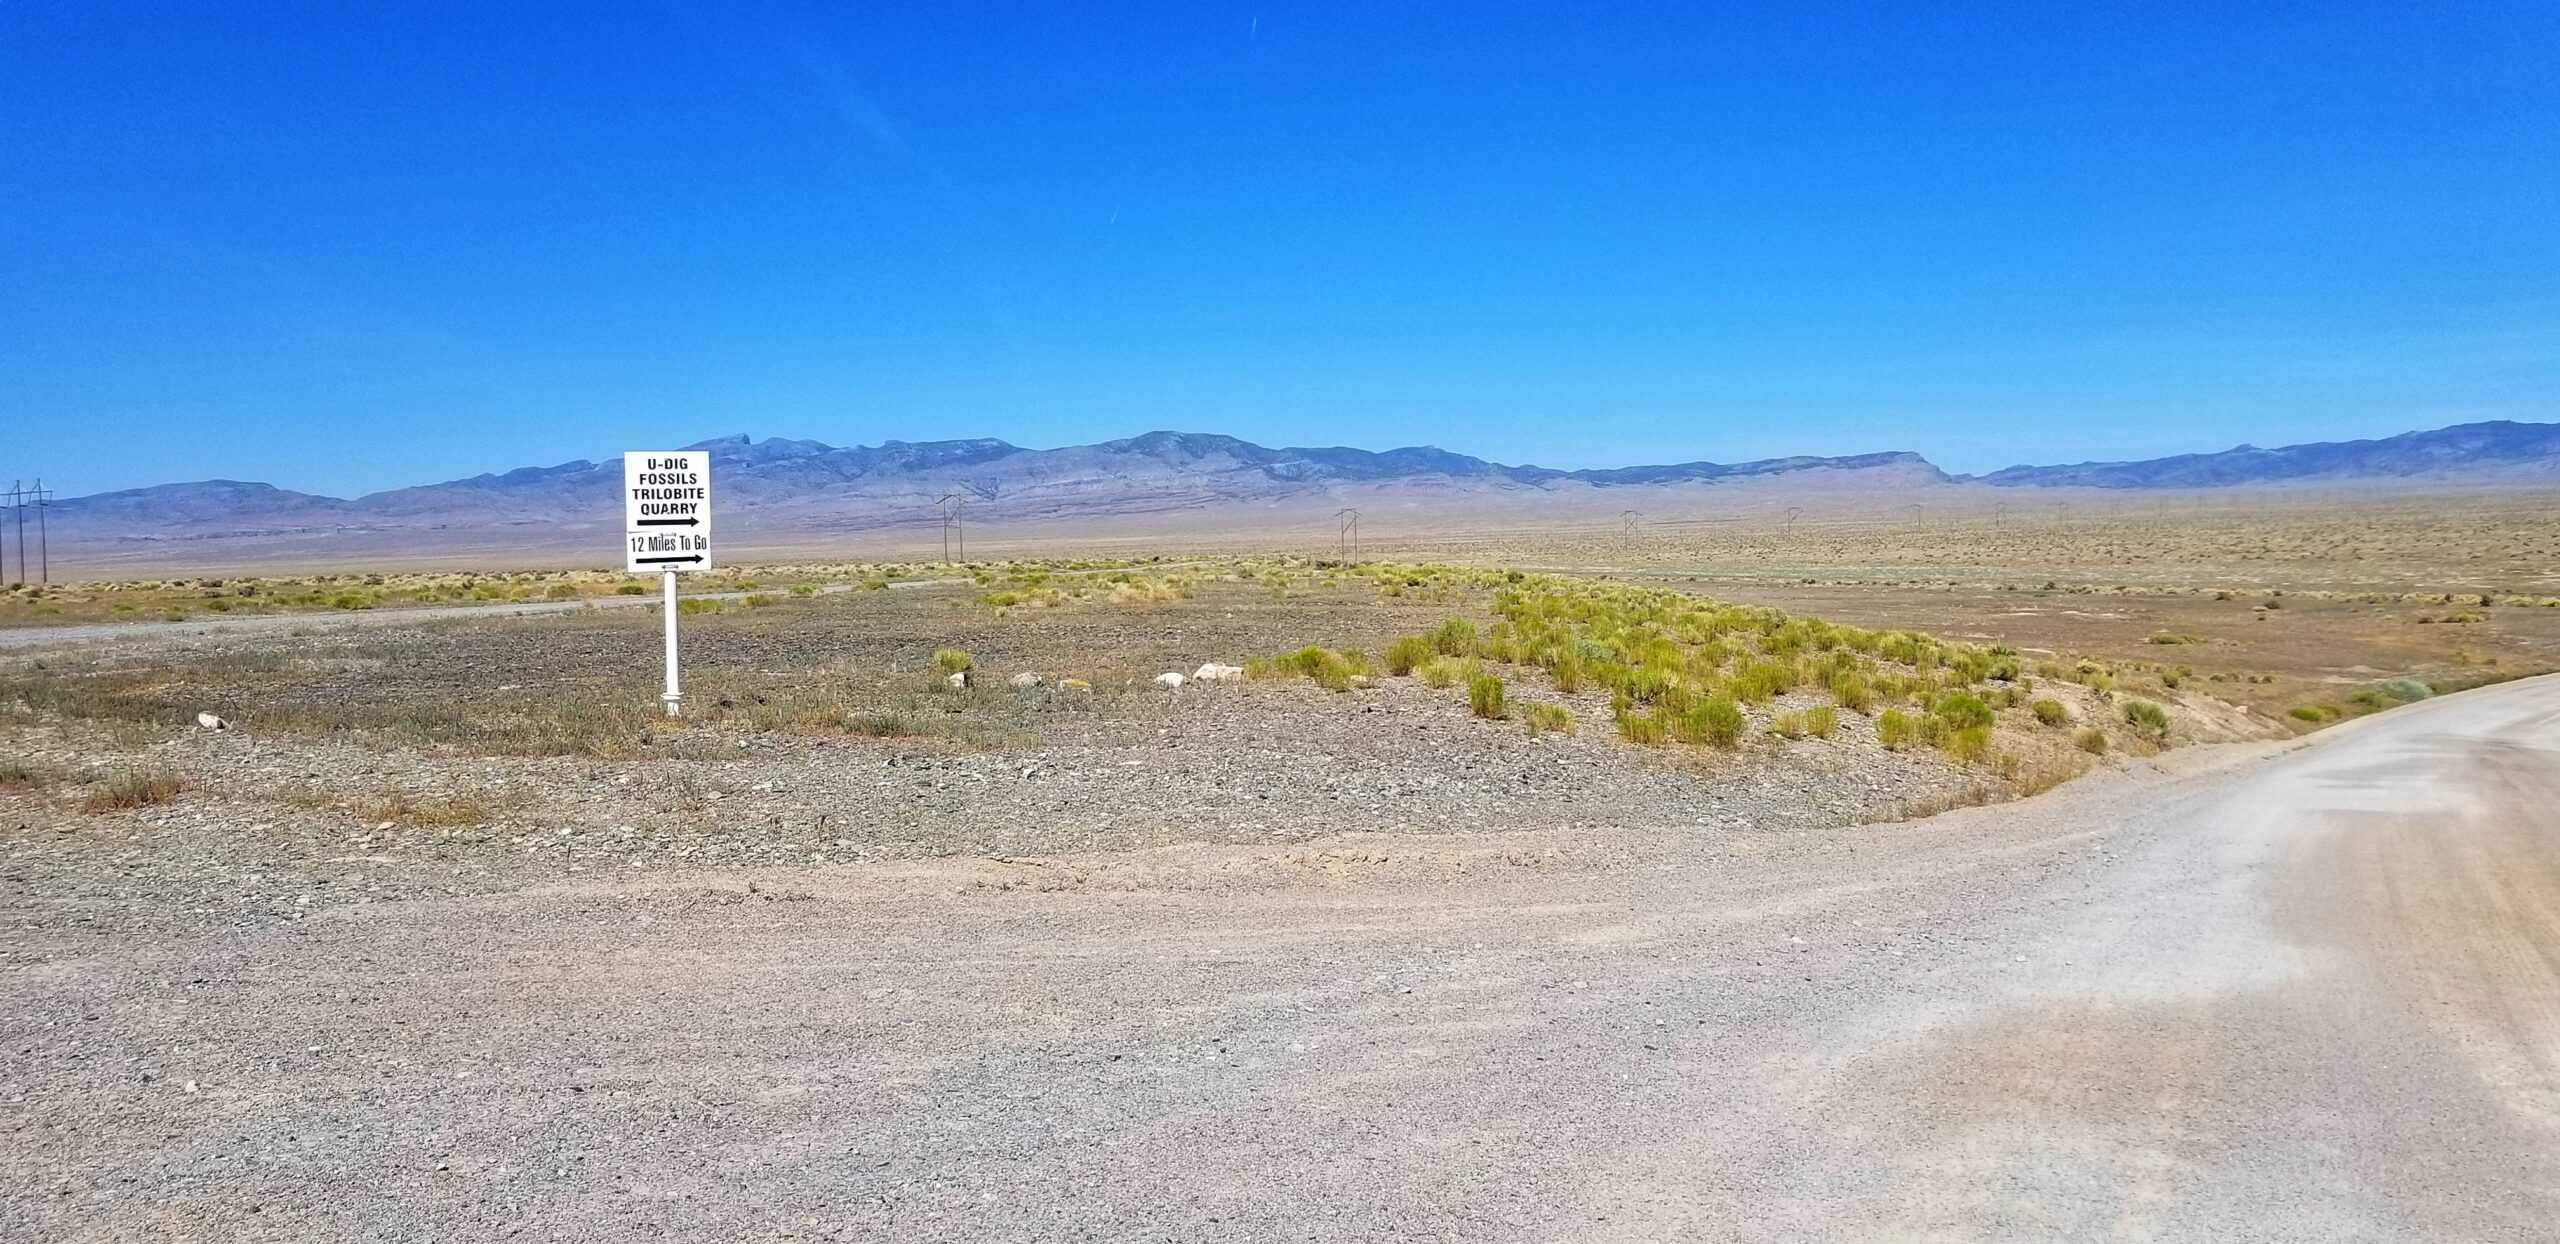 U Dig Trilobite Quarry road